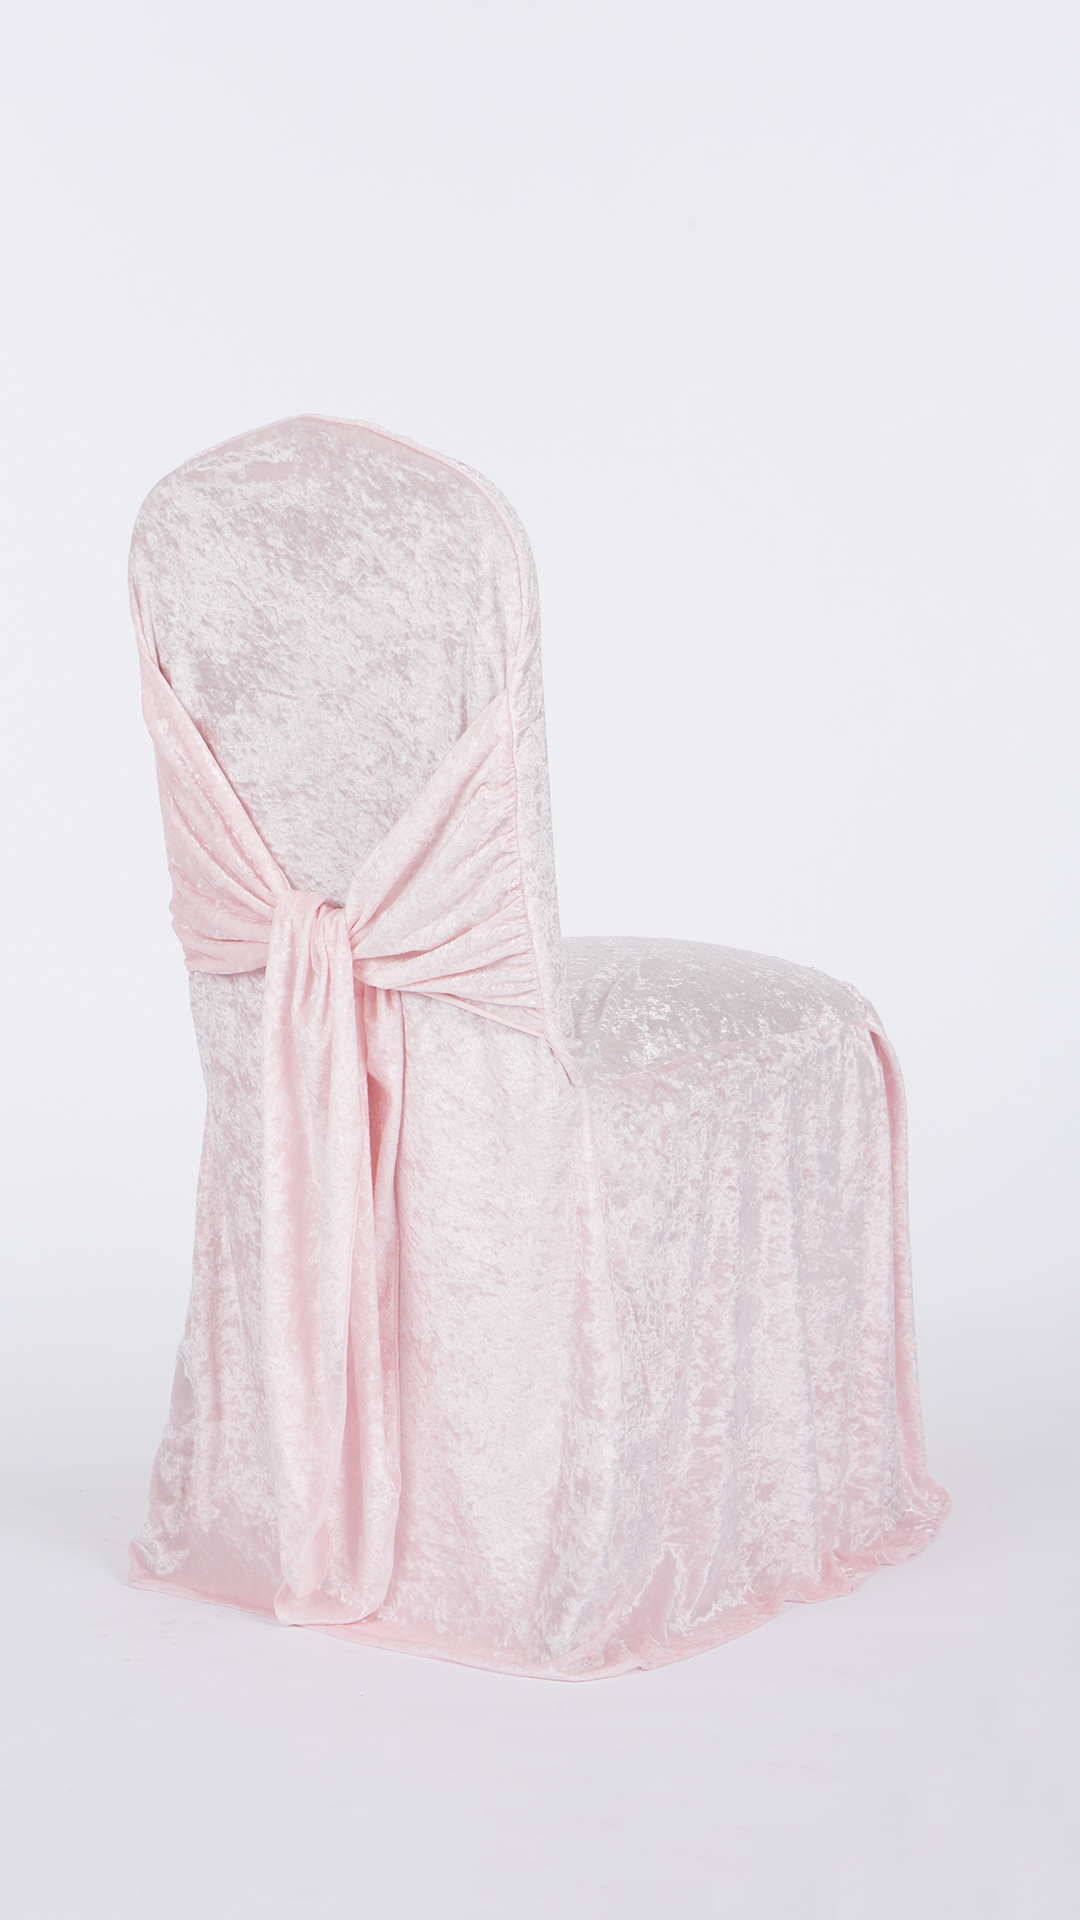 chair covers pink doc mcstuffins canada velvet bella cover decor chaircovers bellachaircovers pinkvelvet 1